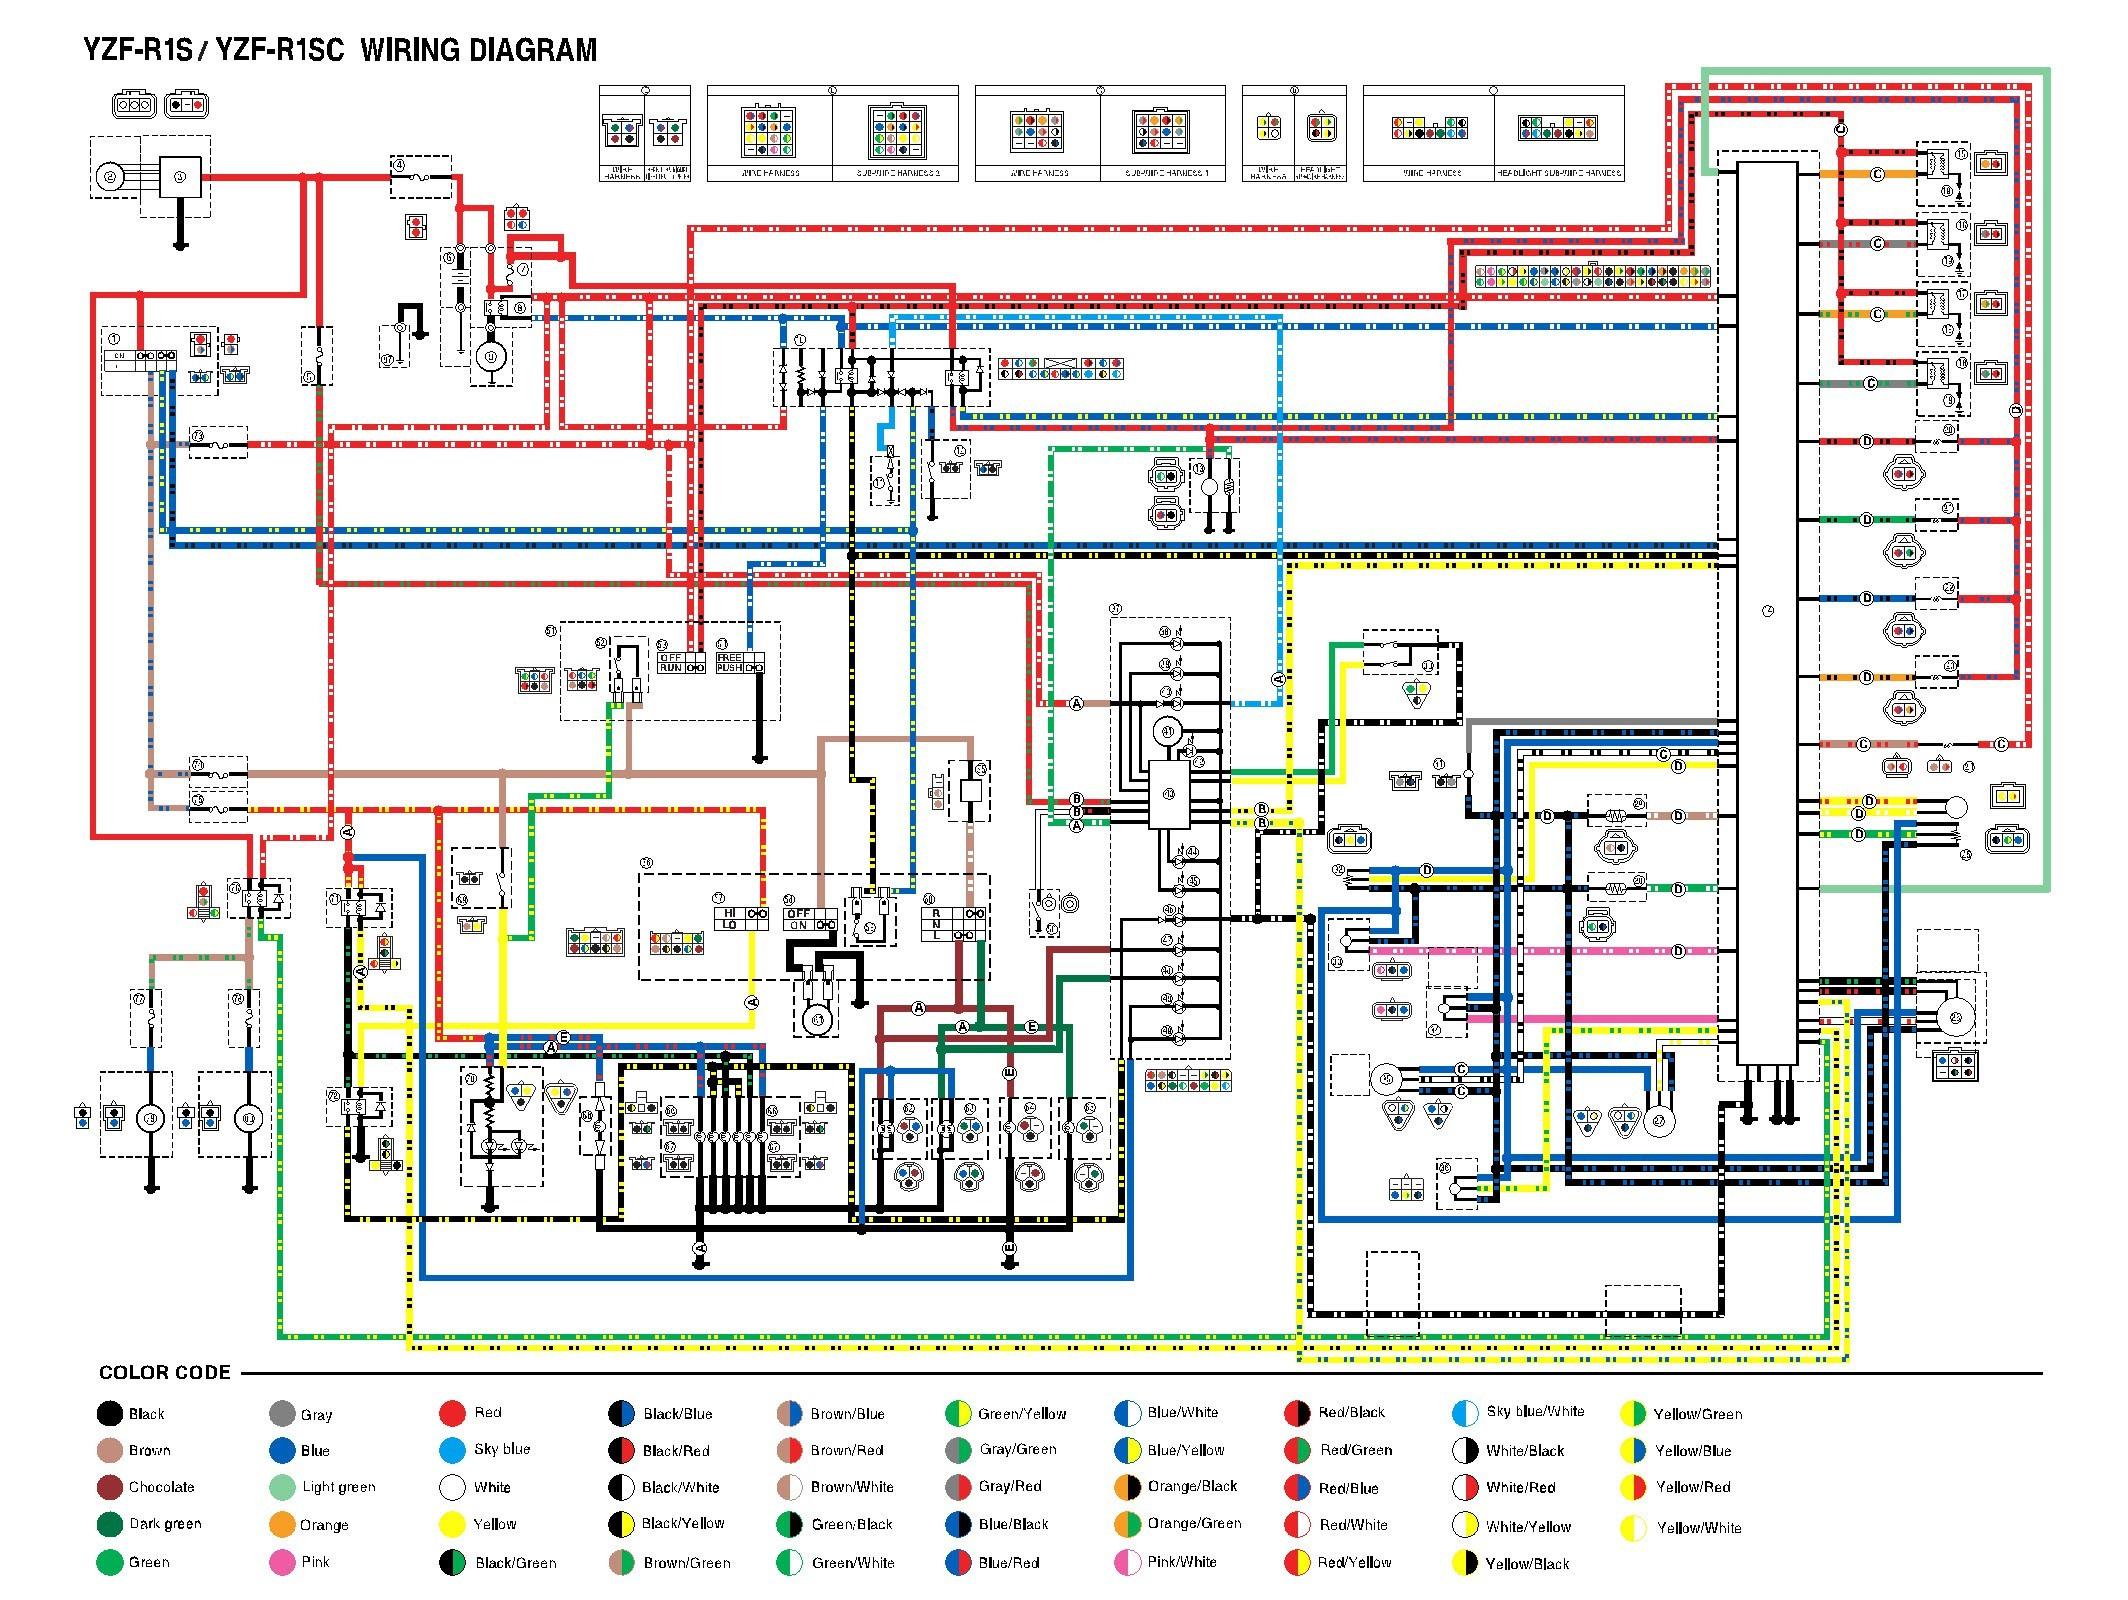 Car Electrical Wiring Eccu Wiring Harness Diagram For Nissan